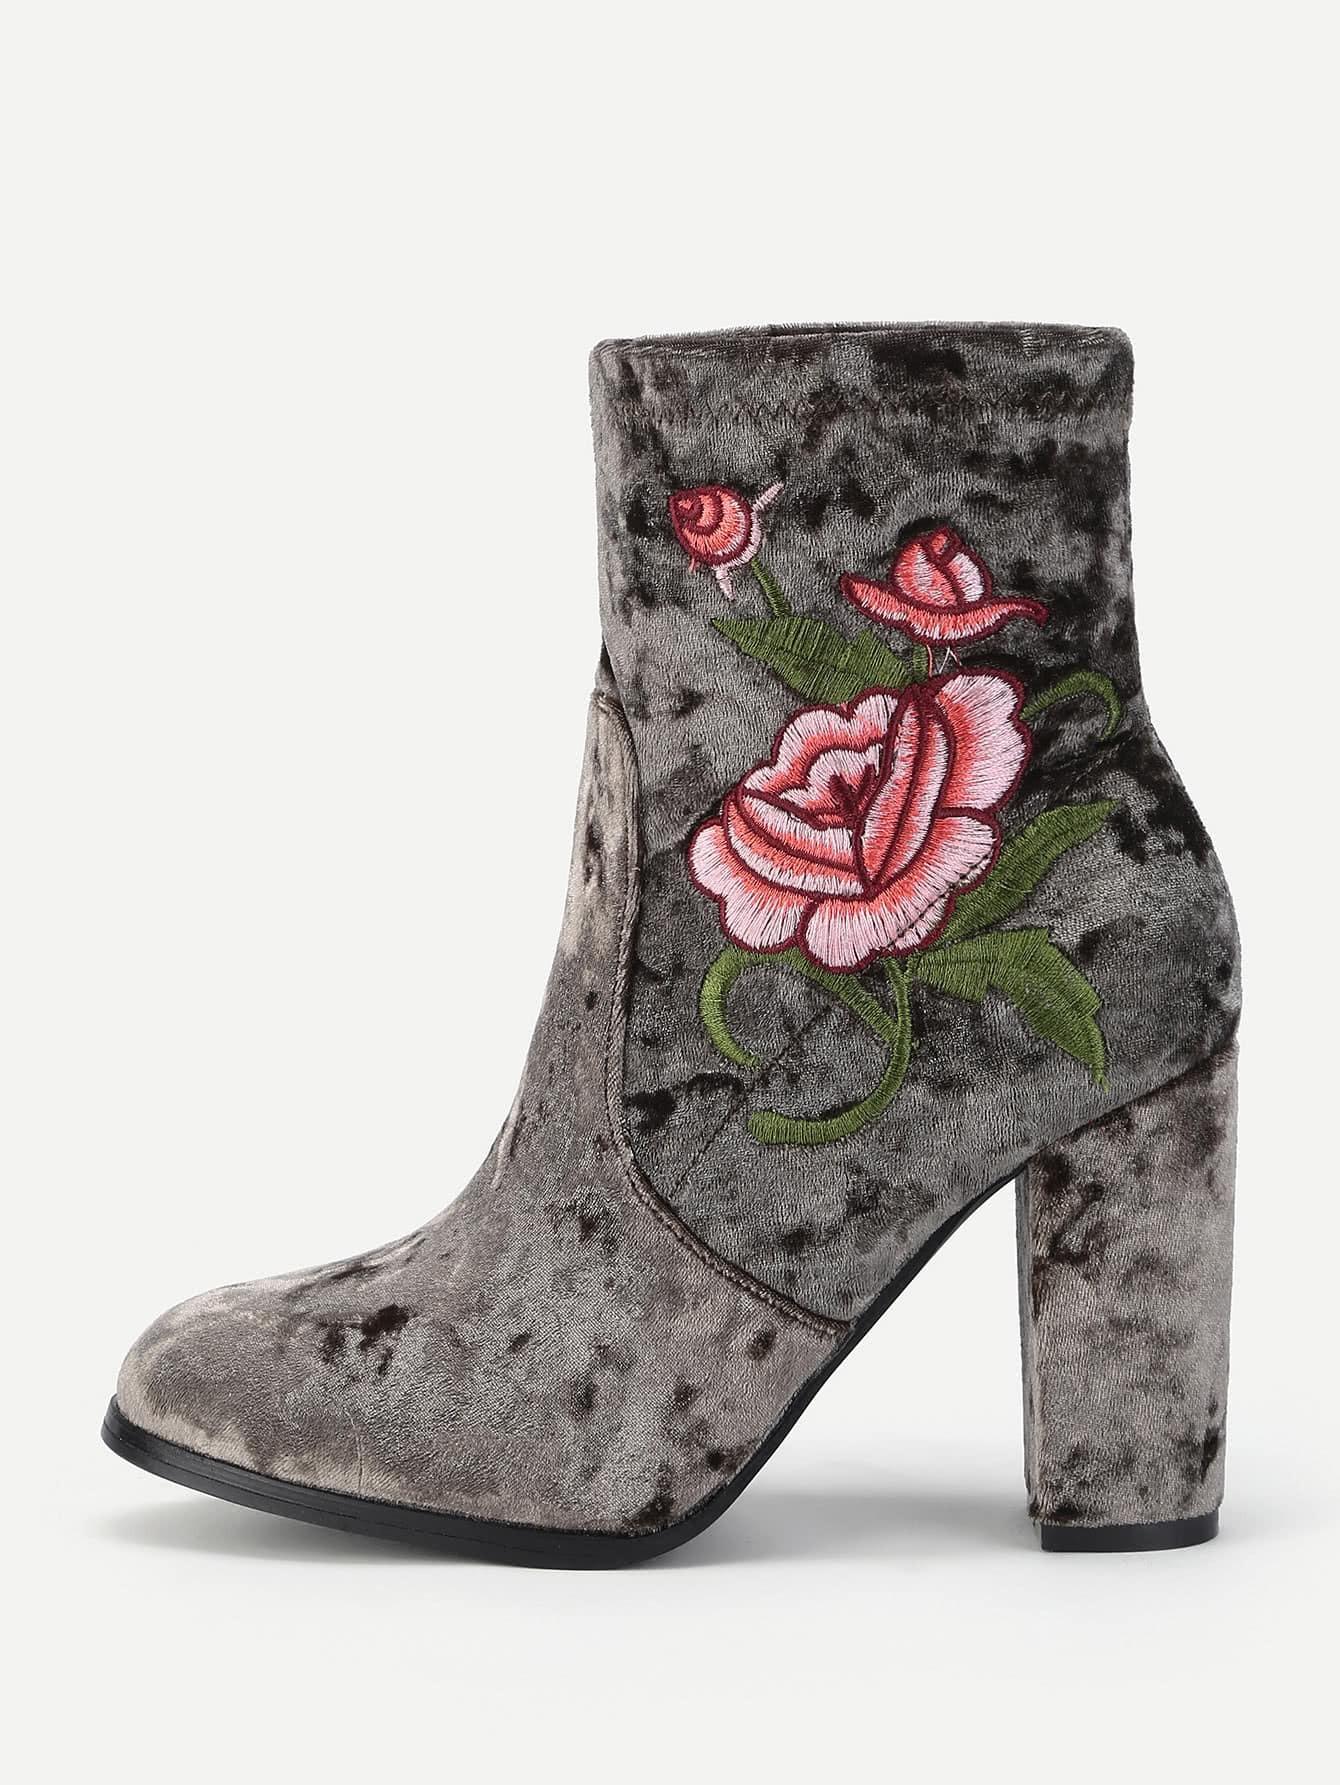 Flower Embroidered Velvet High Heeled Boots rhinestone flower embellished heeled boots